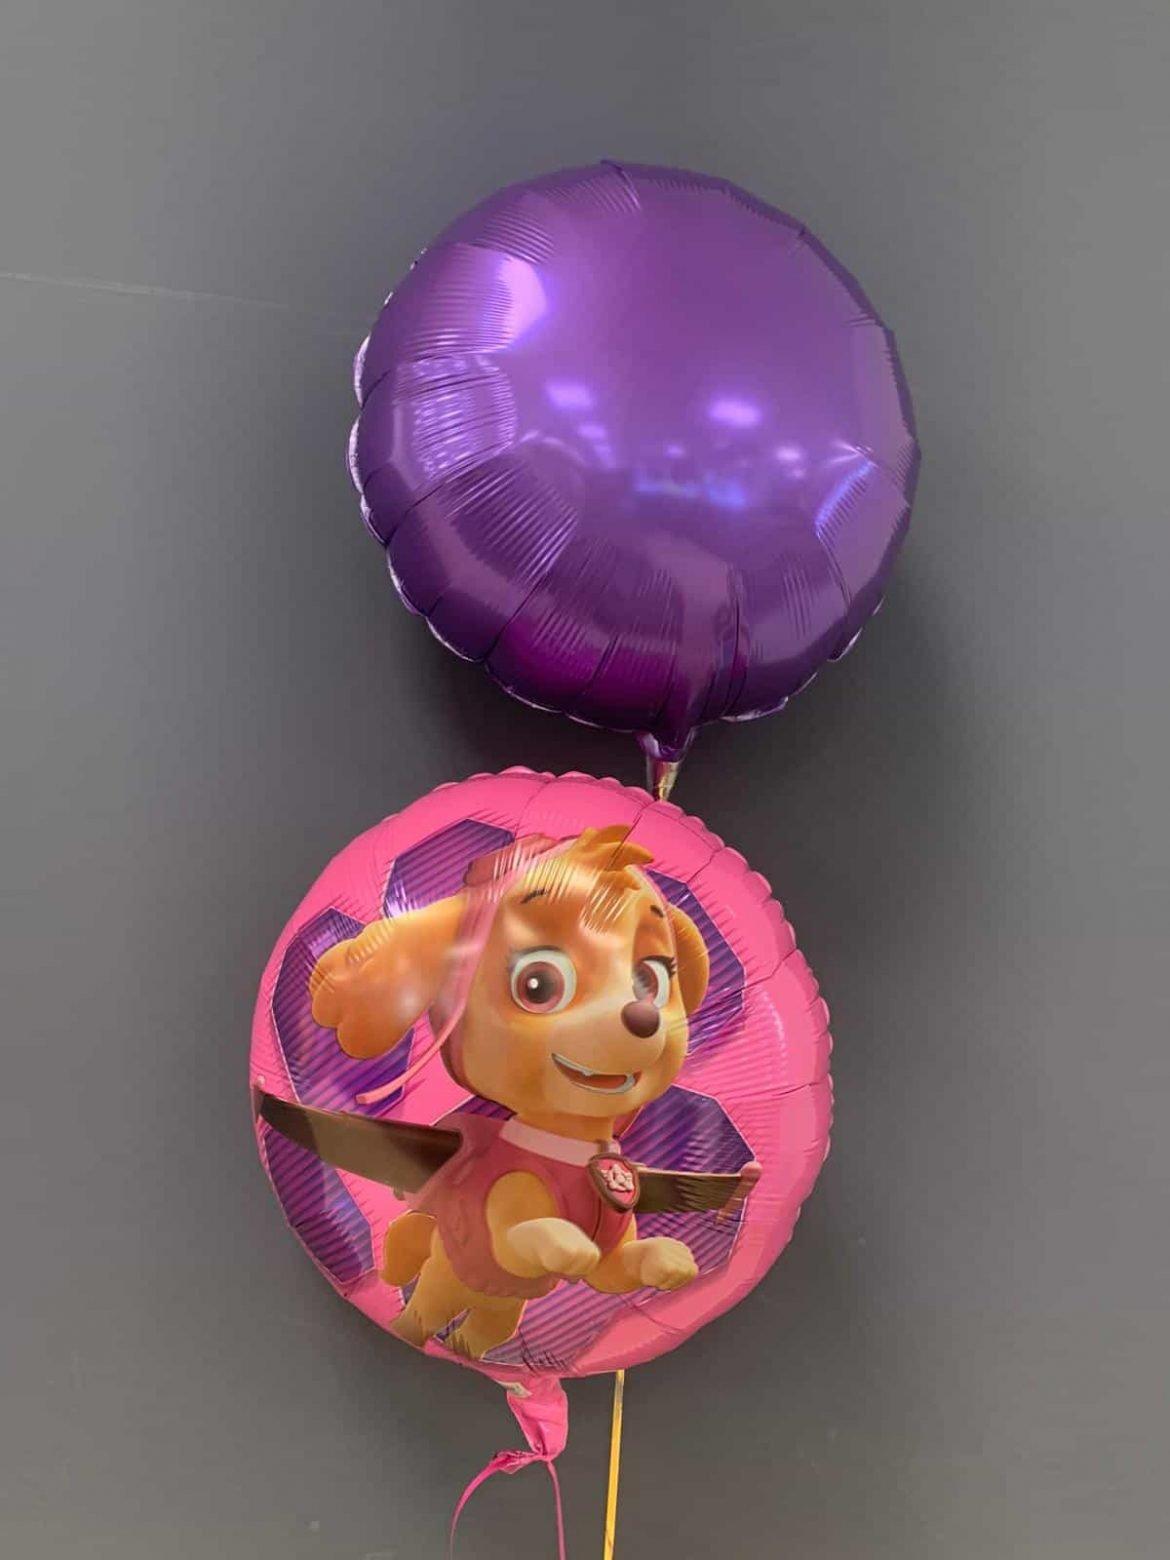 Paw Patrol Ballon € 5,50 und Dekoballon lila € 4,50 1